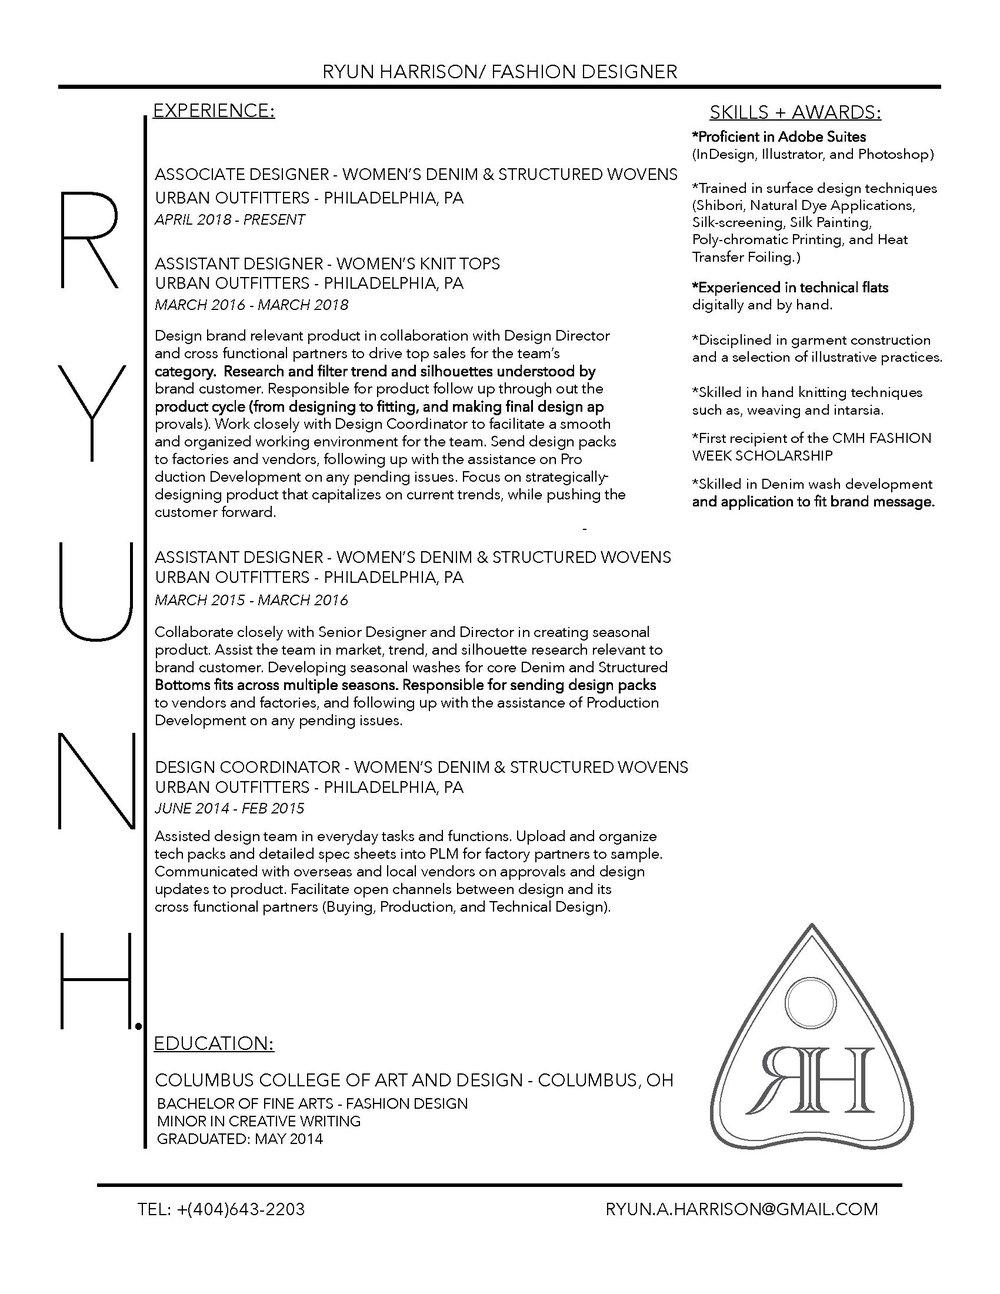 RYUN HARRISON RESUME_2018.jpg